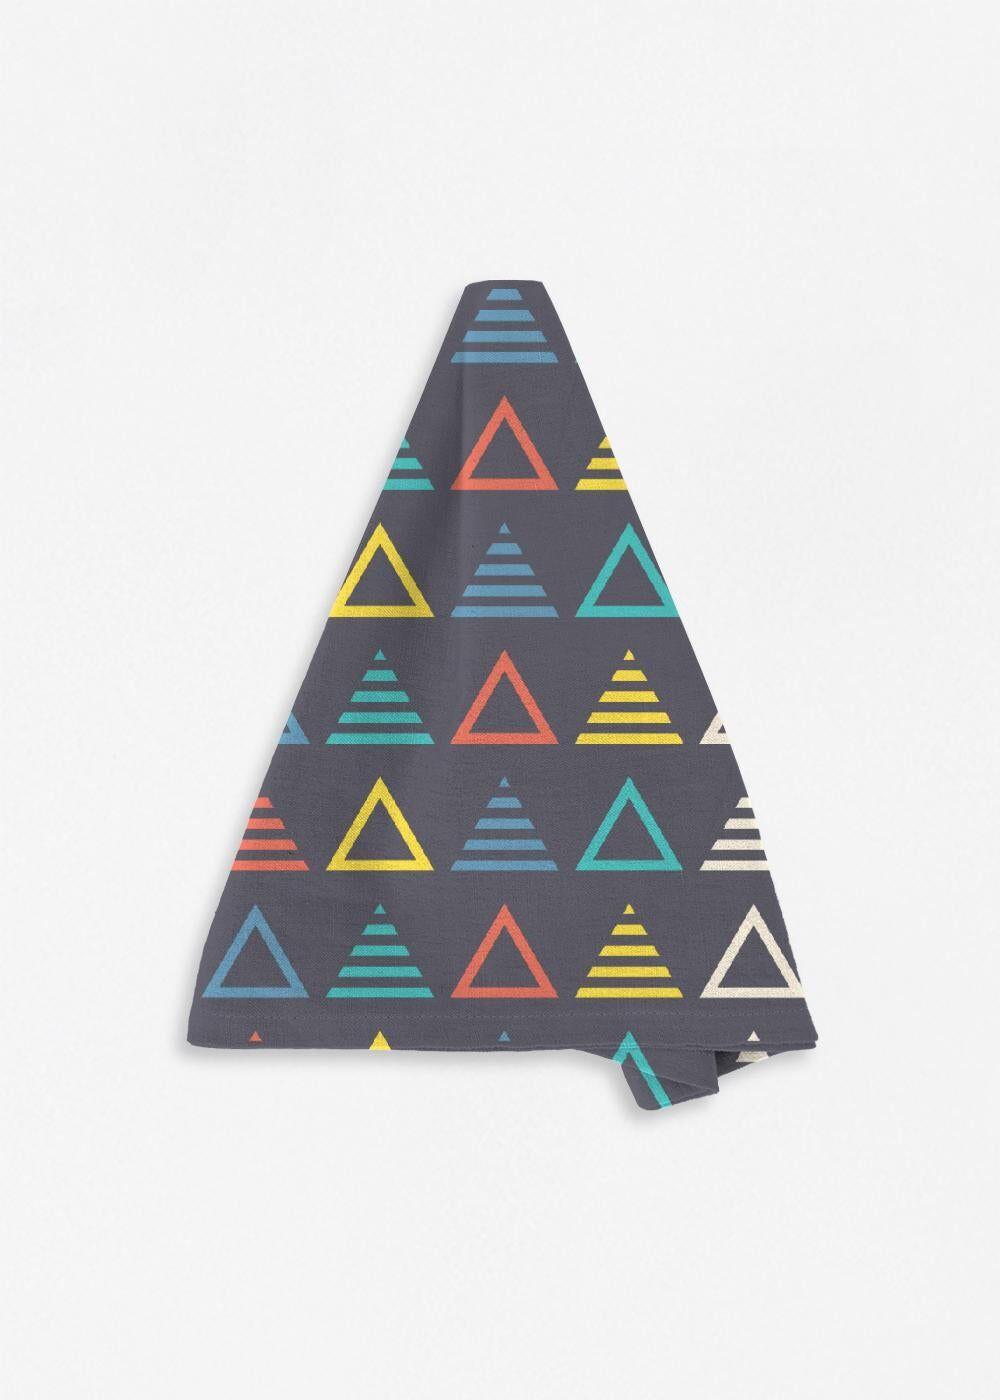 VIDA Napkin Set - Music Symmetric Triangle by VIDA Original Artist  - Size: Set of 4